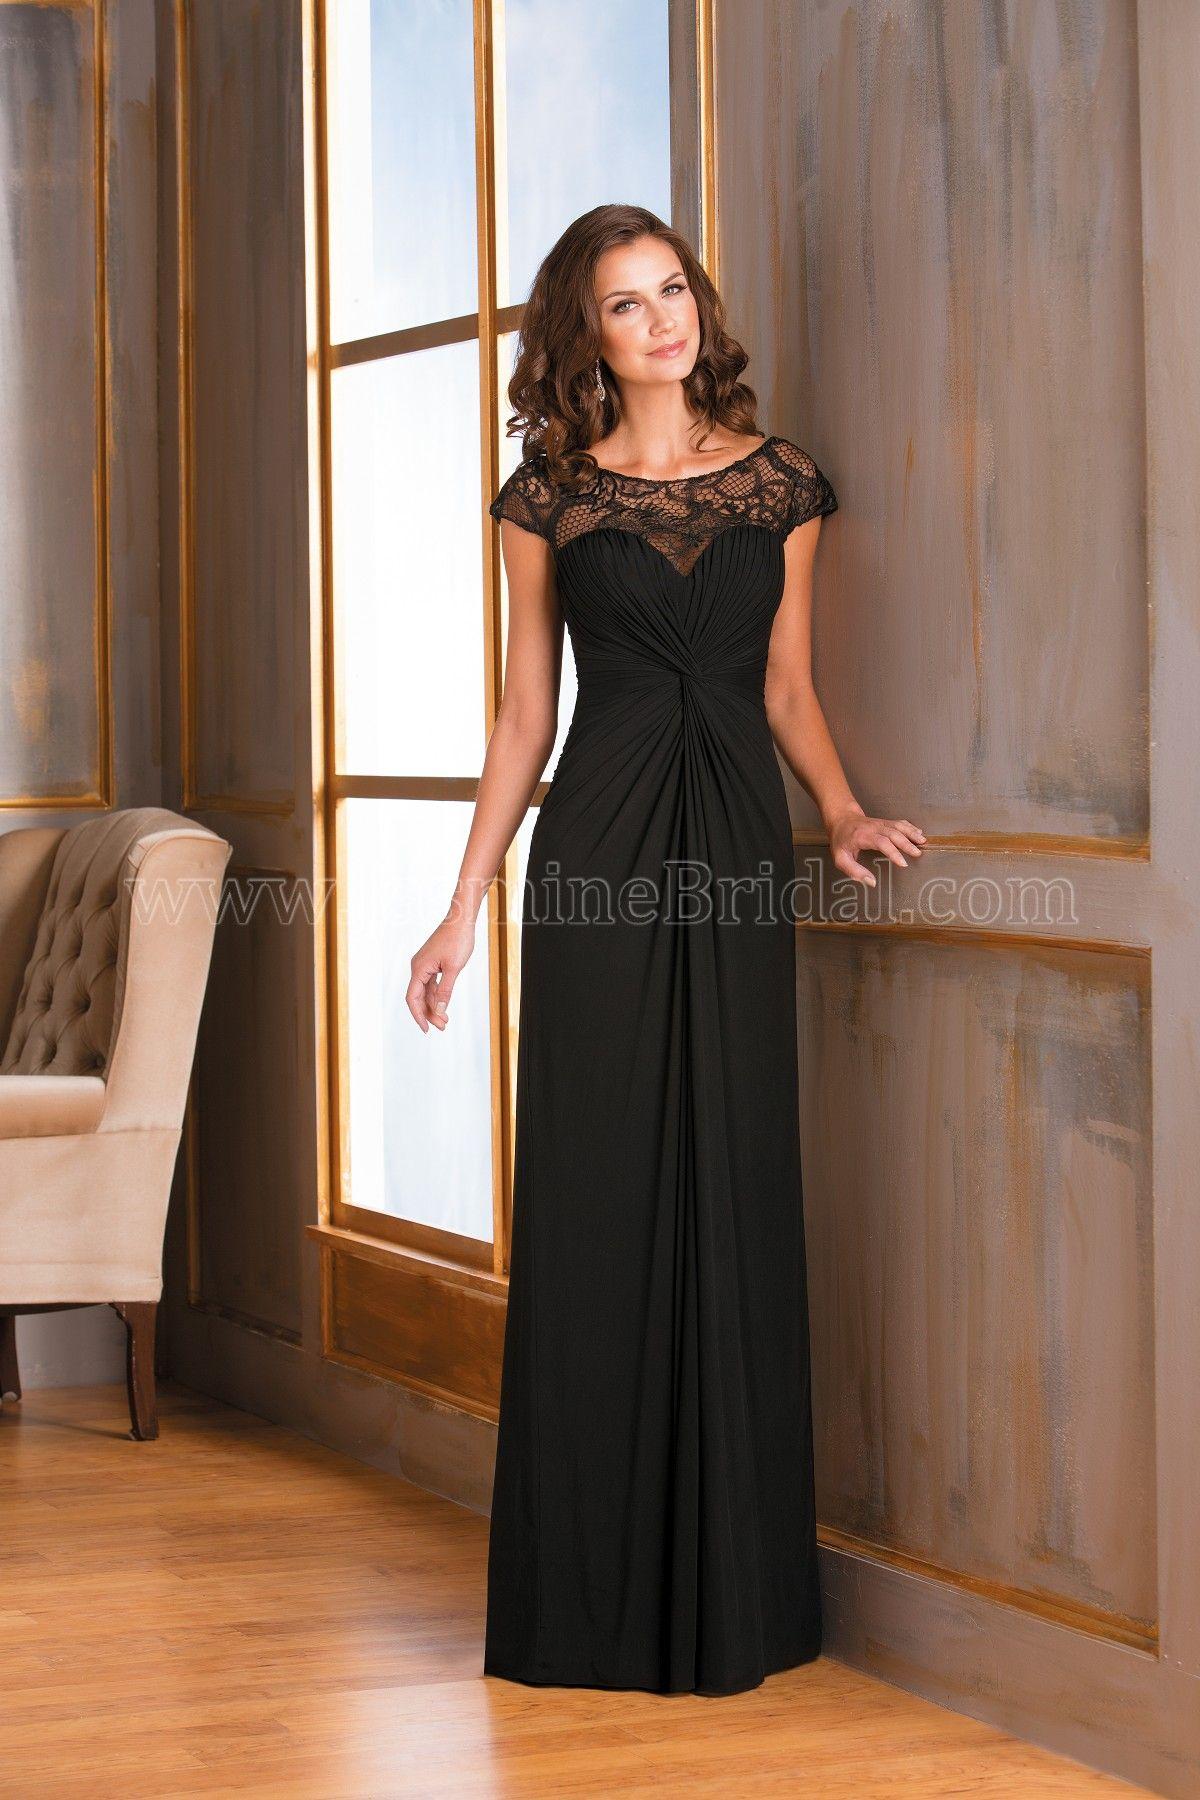 Jasmine Bridal Mother of the Bride/Groom Dress Jade Style J175015 ...